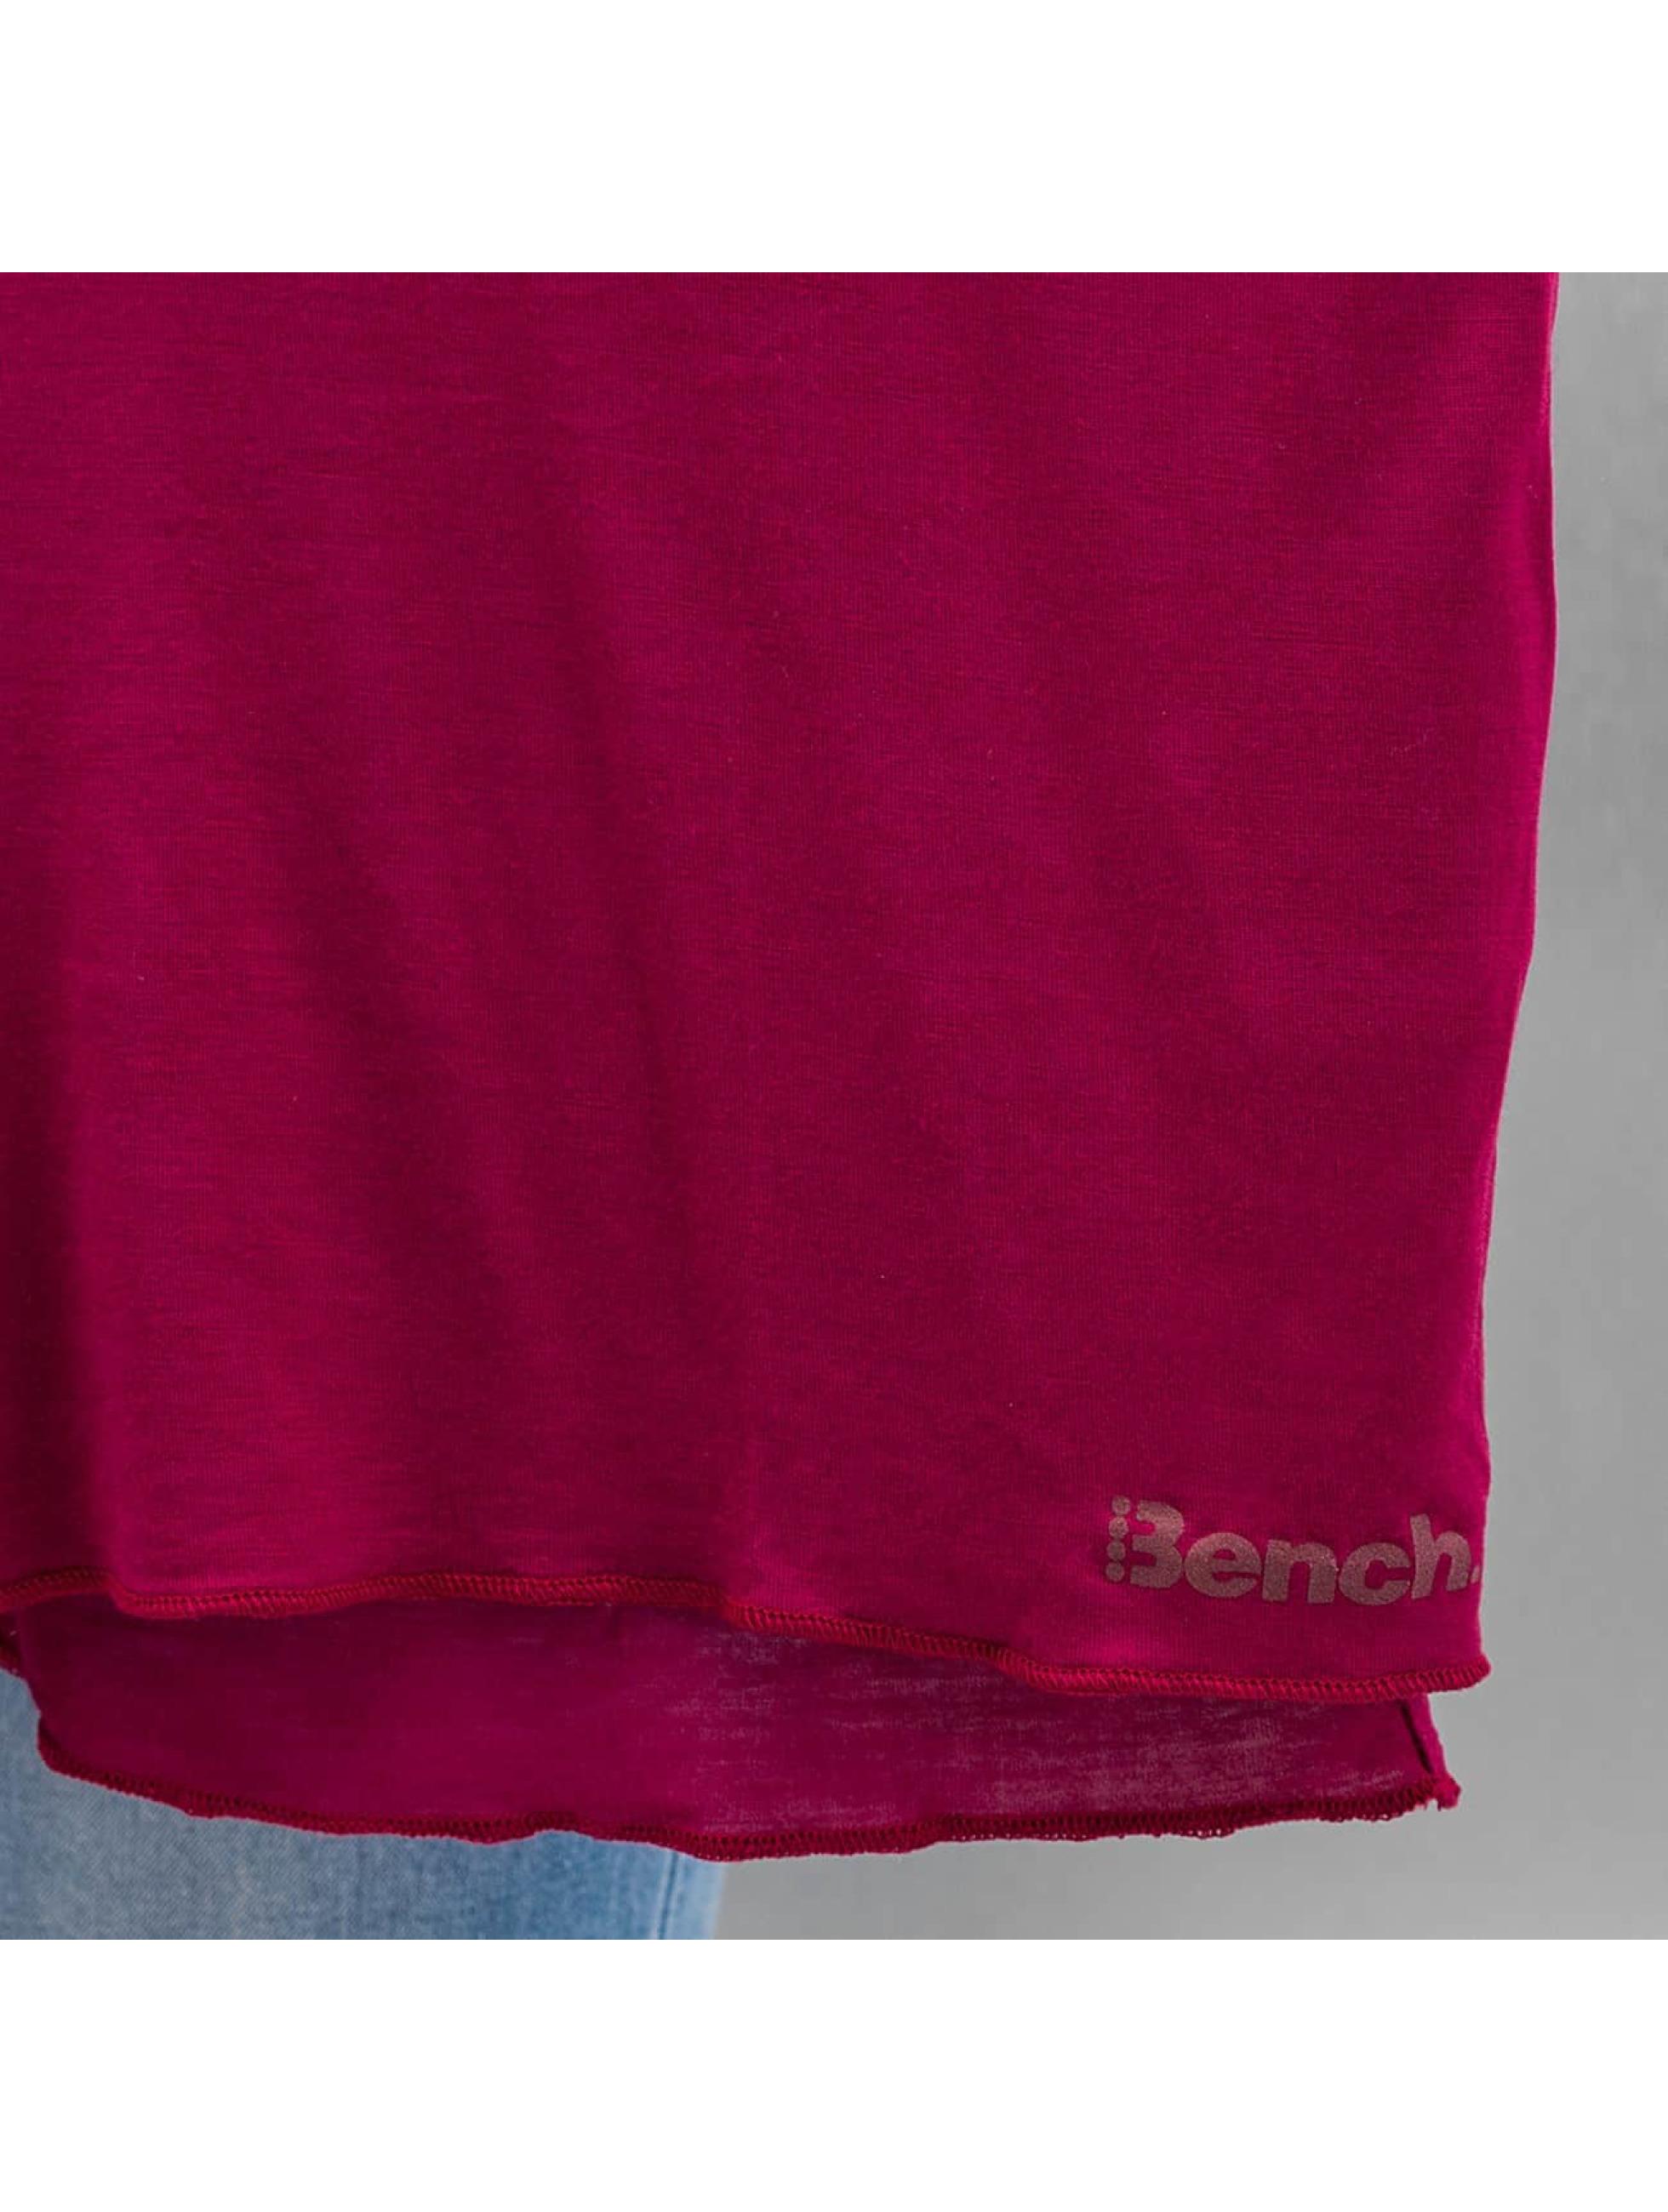 Bench Водолазка Performance Addendum Oversize красный